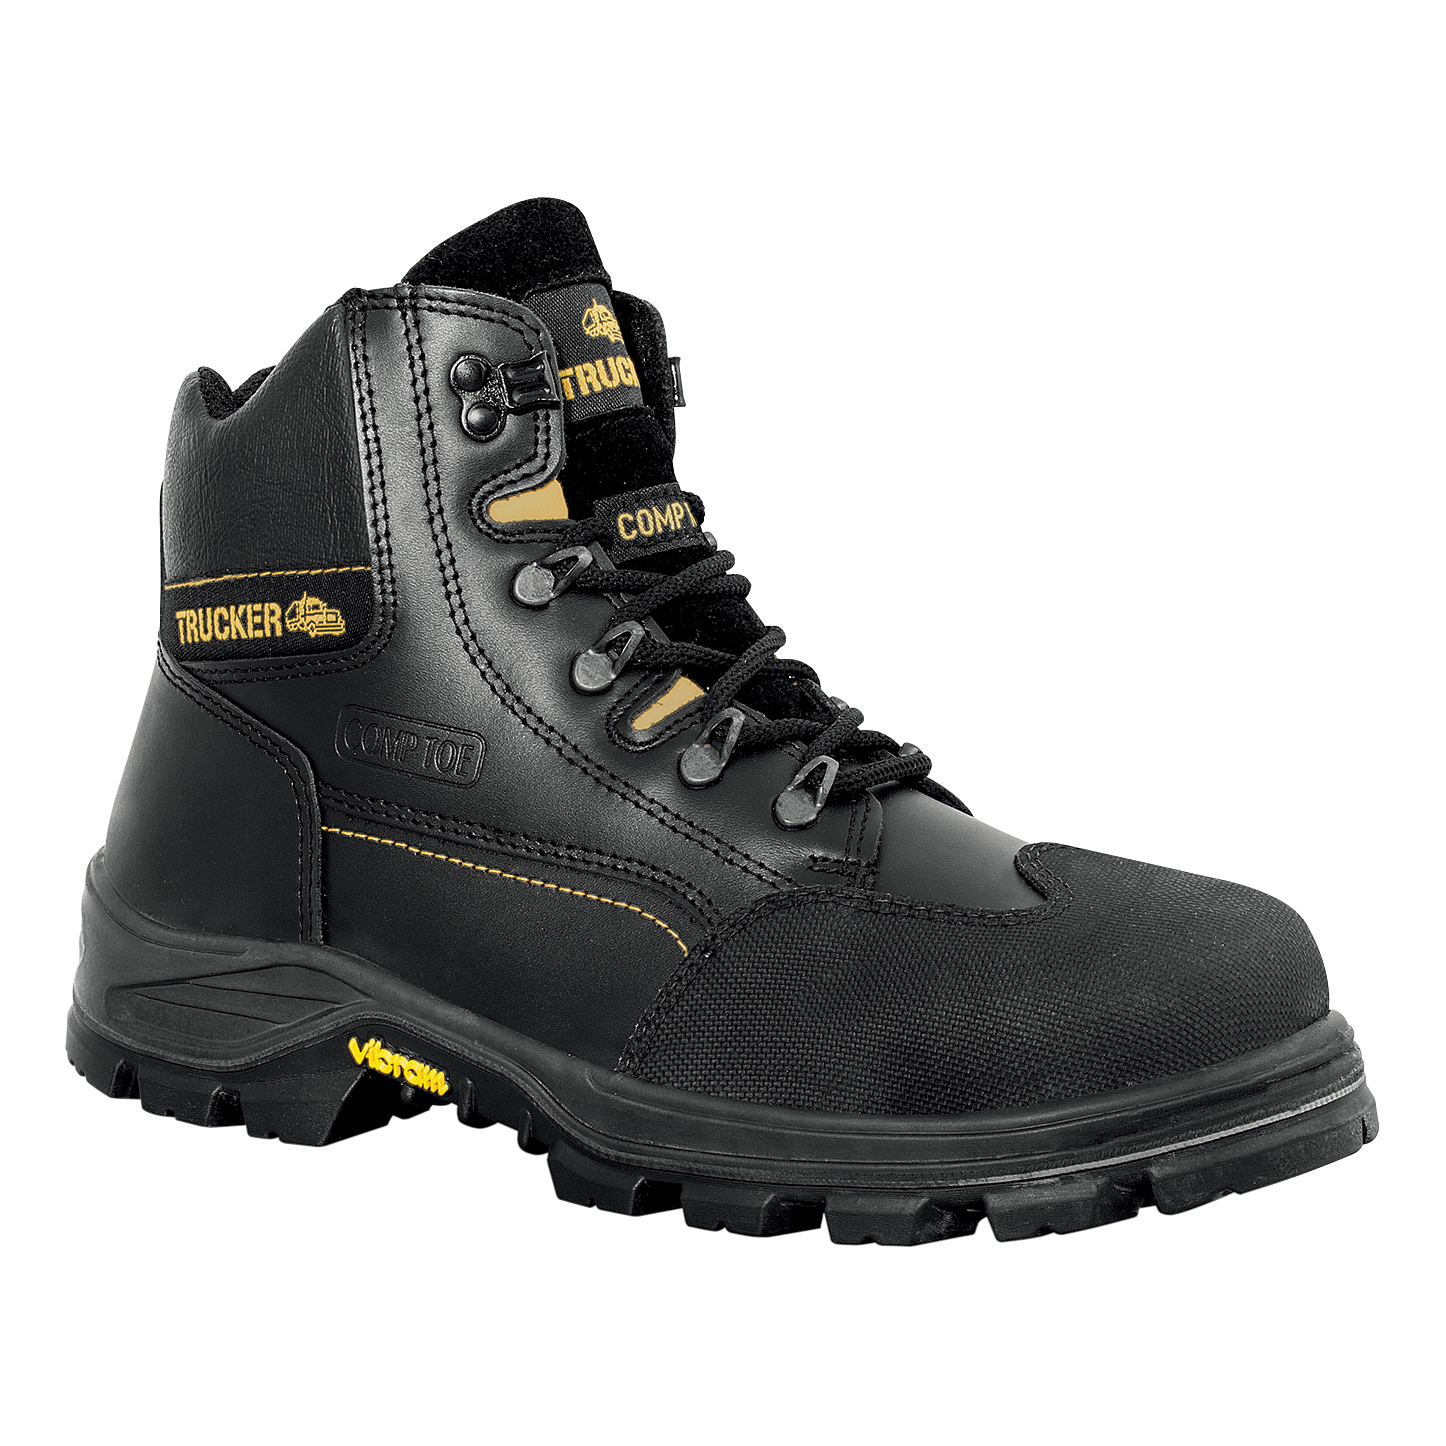 Aimont Revenger Safety Boots Protective Toecap Size 10 Black Ref 7TR0610 [Pair]